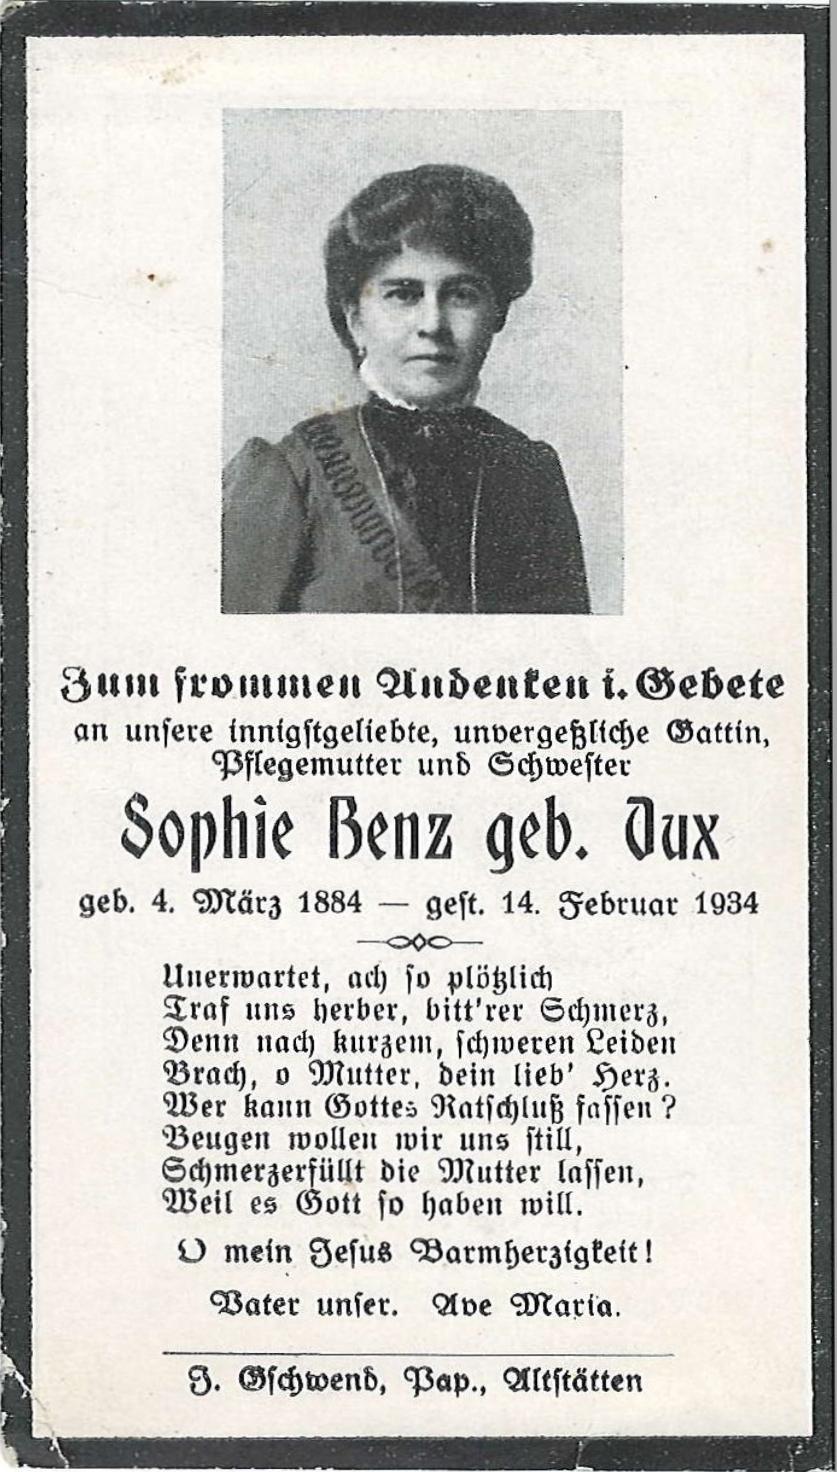 Sophie Benz geb. Dux (1884-1934)